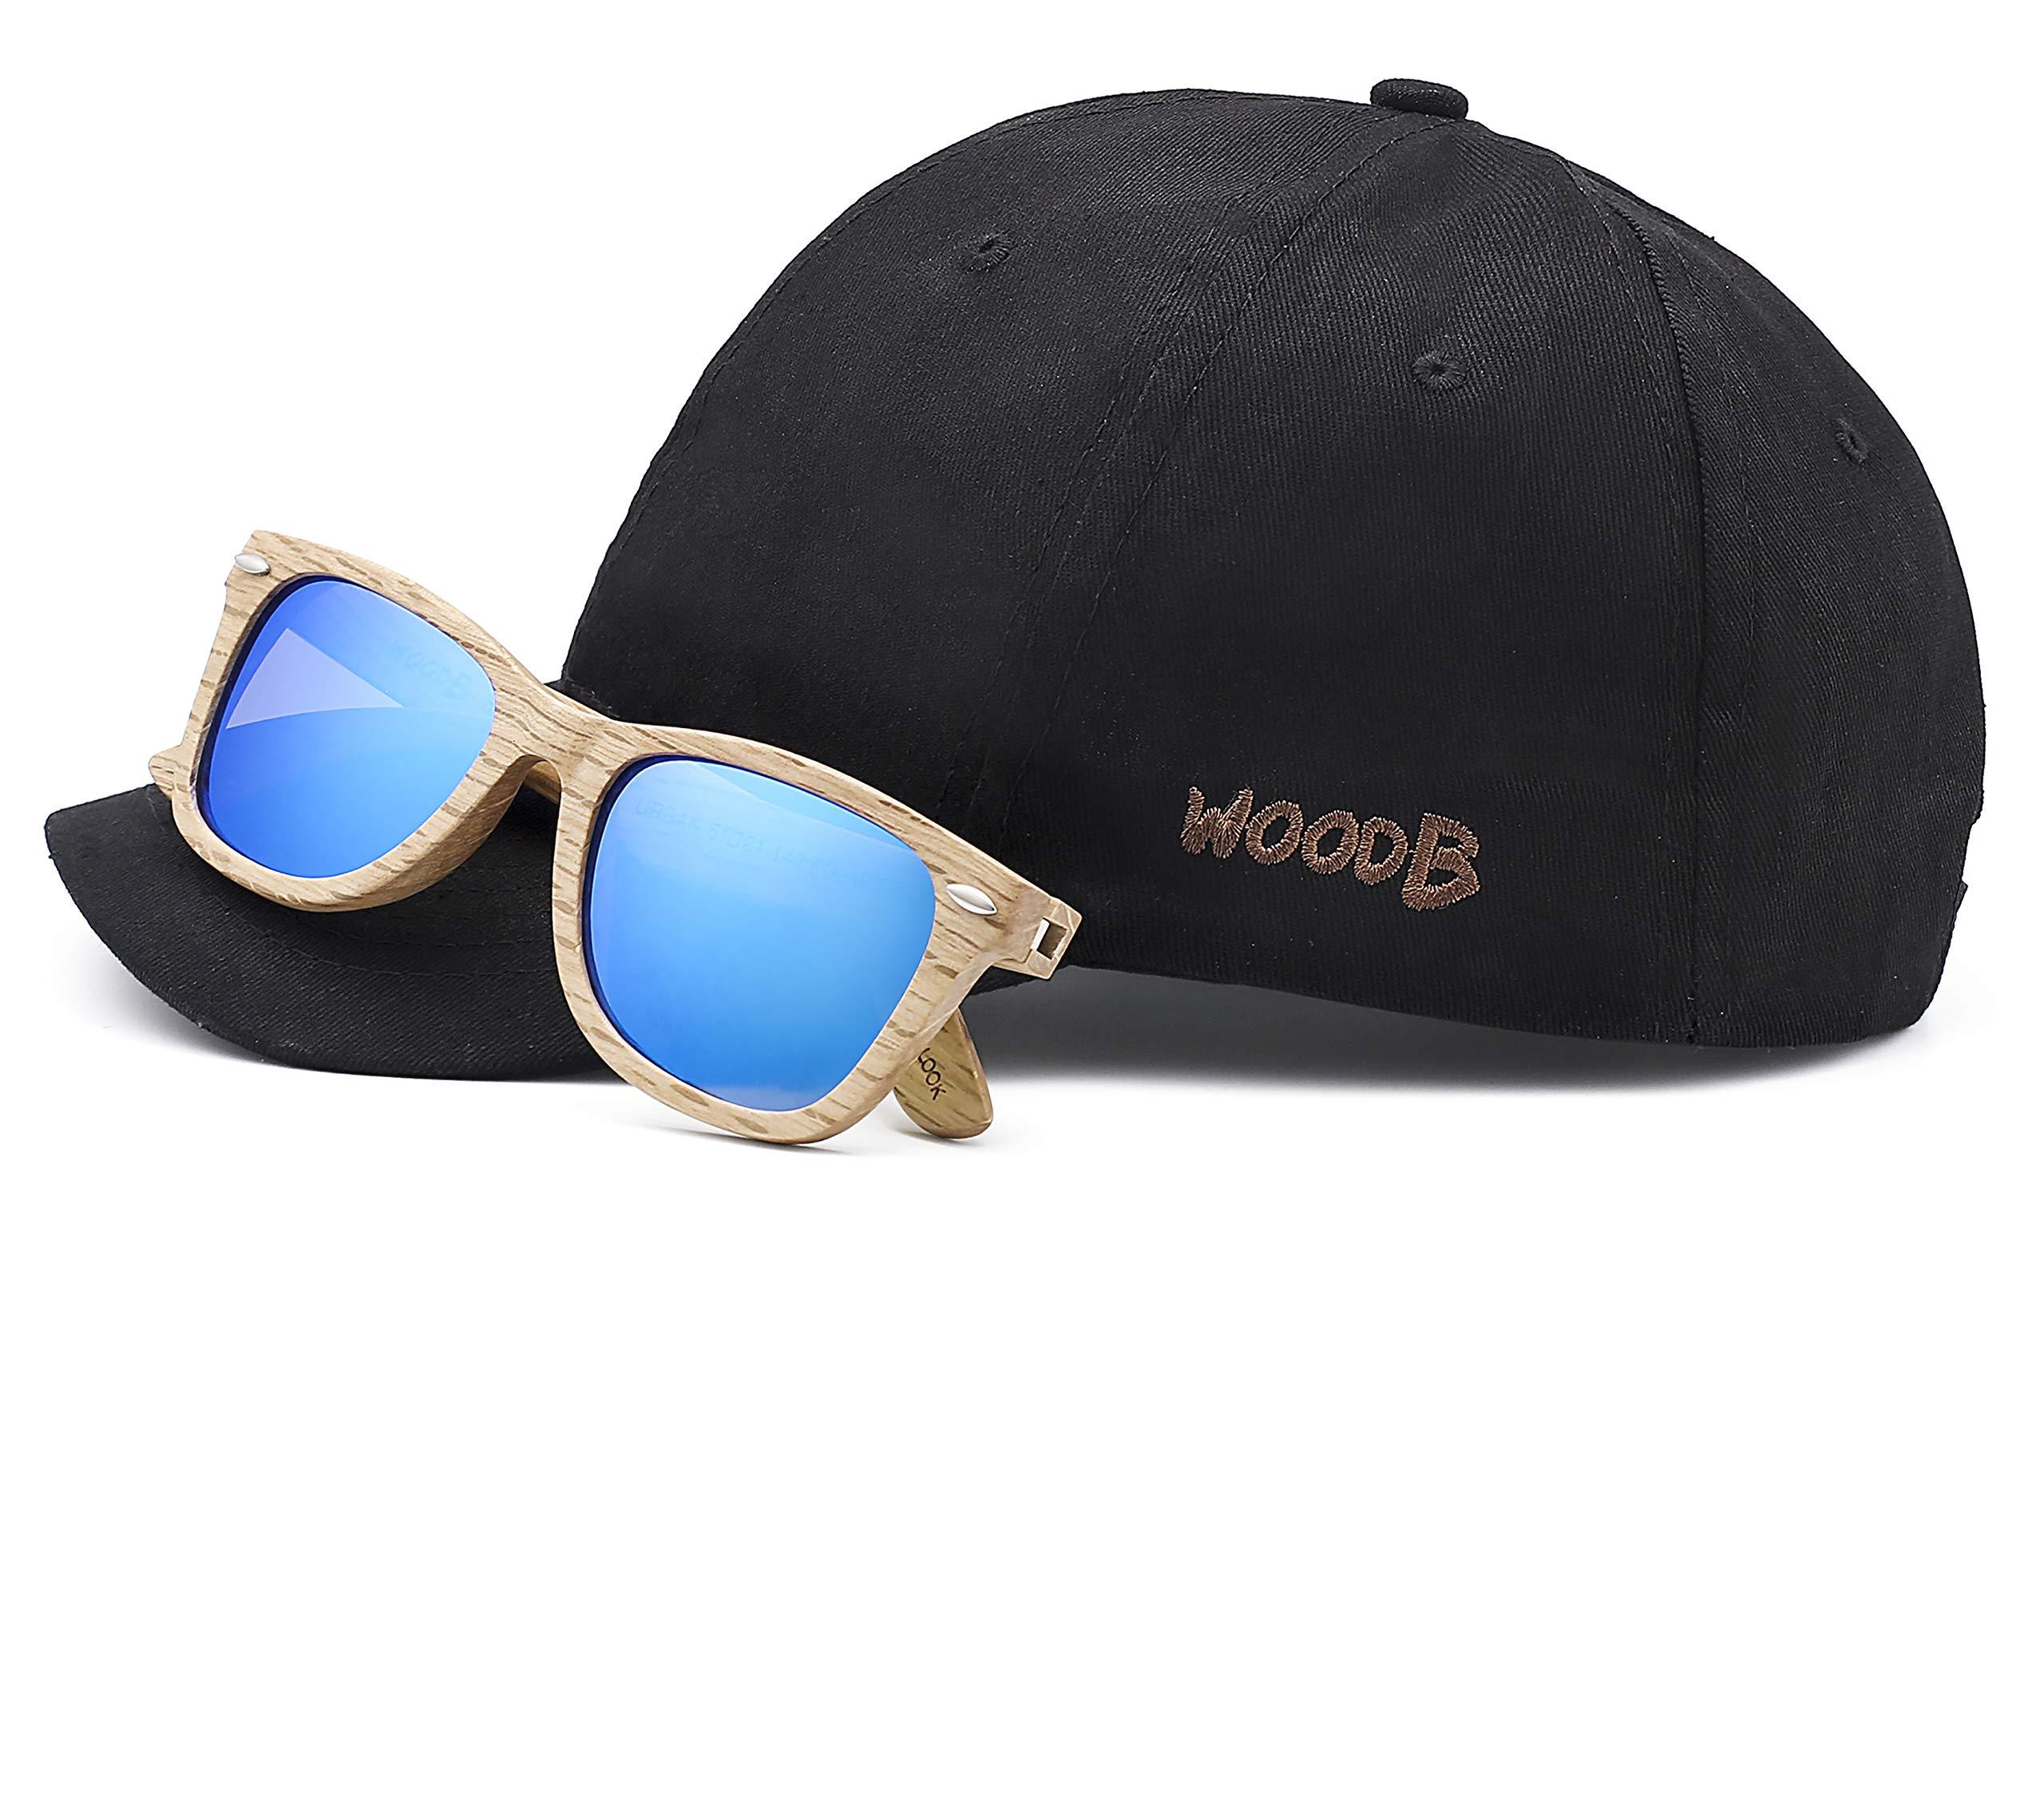 Real Wood Sunglasses Wayfarer UV-400 Polarized Lenses Plus Cap in Gift box